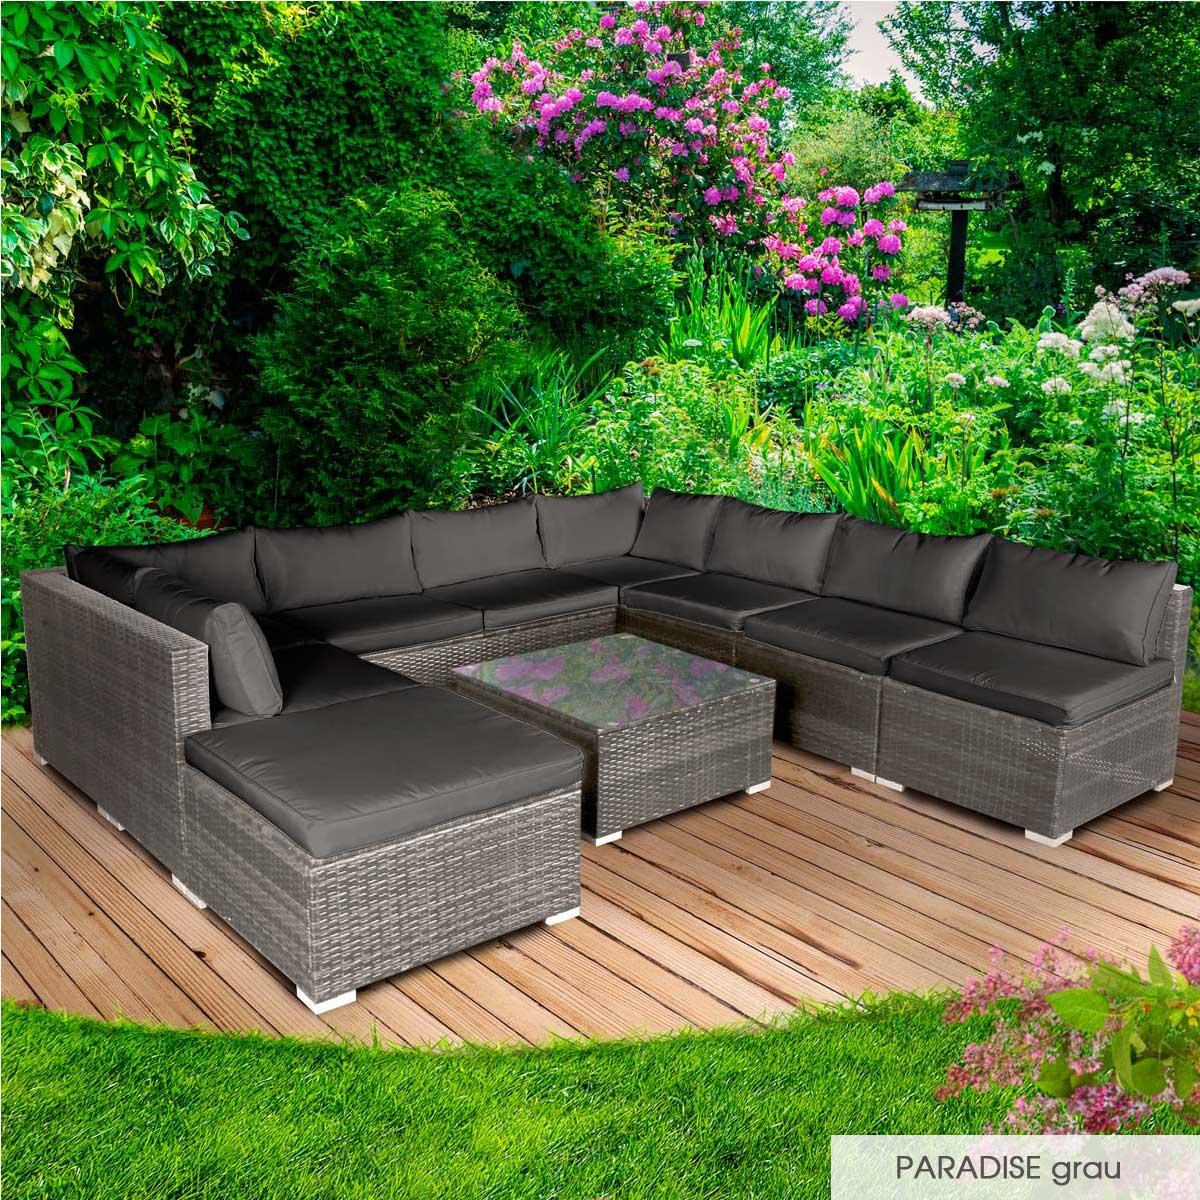 Gartenmoebel-Poly-Rattan-Lounge-Moebel-Sitzgarnitur-Gartengarnitur-Sitzgruppe-Sofa Indexbild 39